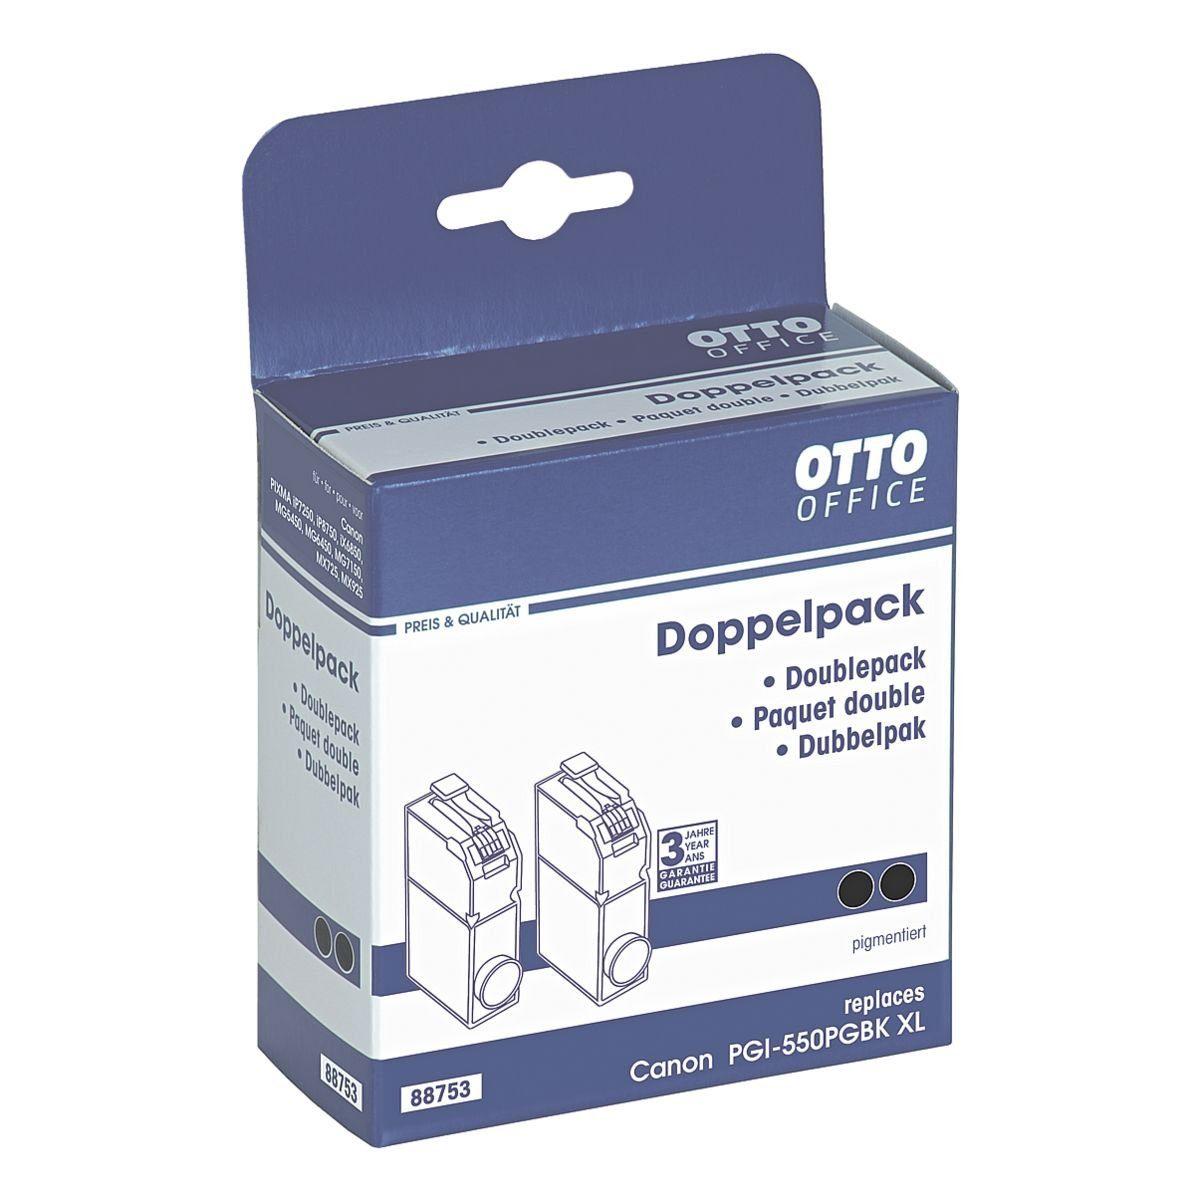 OTTO Office Doppelpack Tintenpatrone ersetzt Canon »PGI-550 PGBK XL...